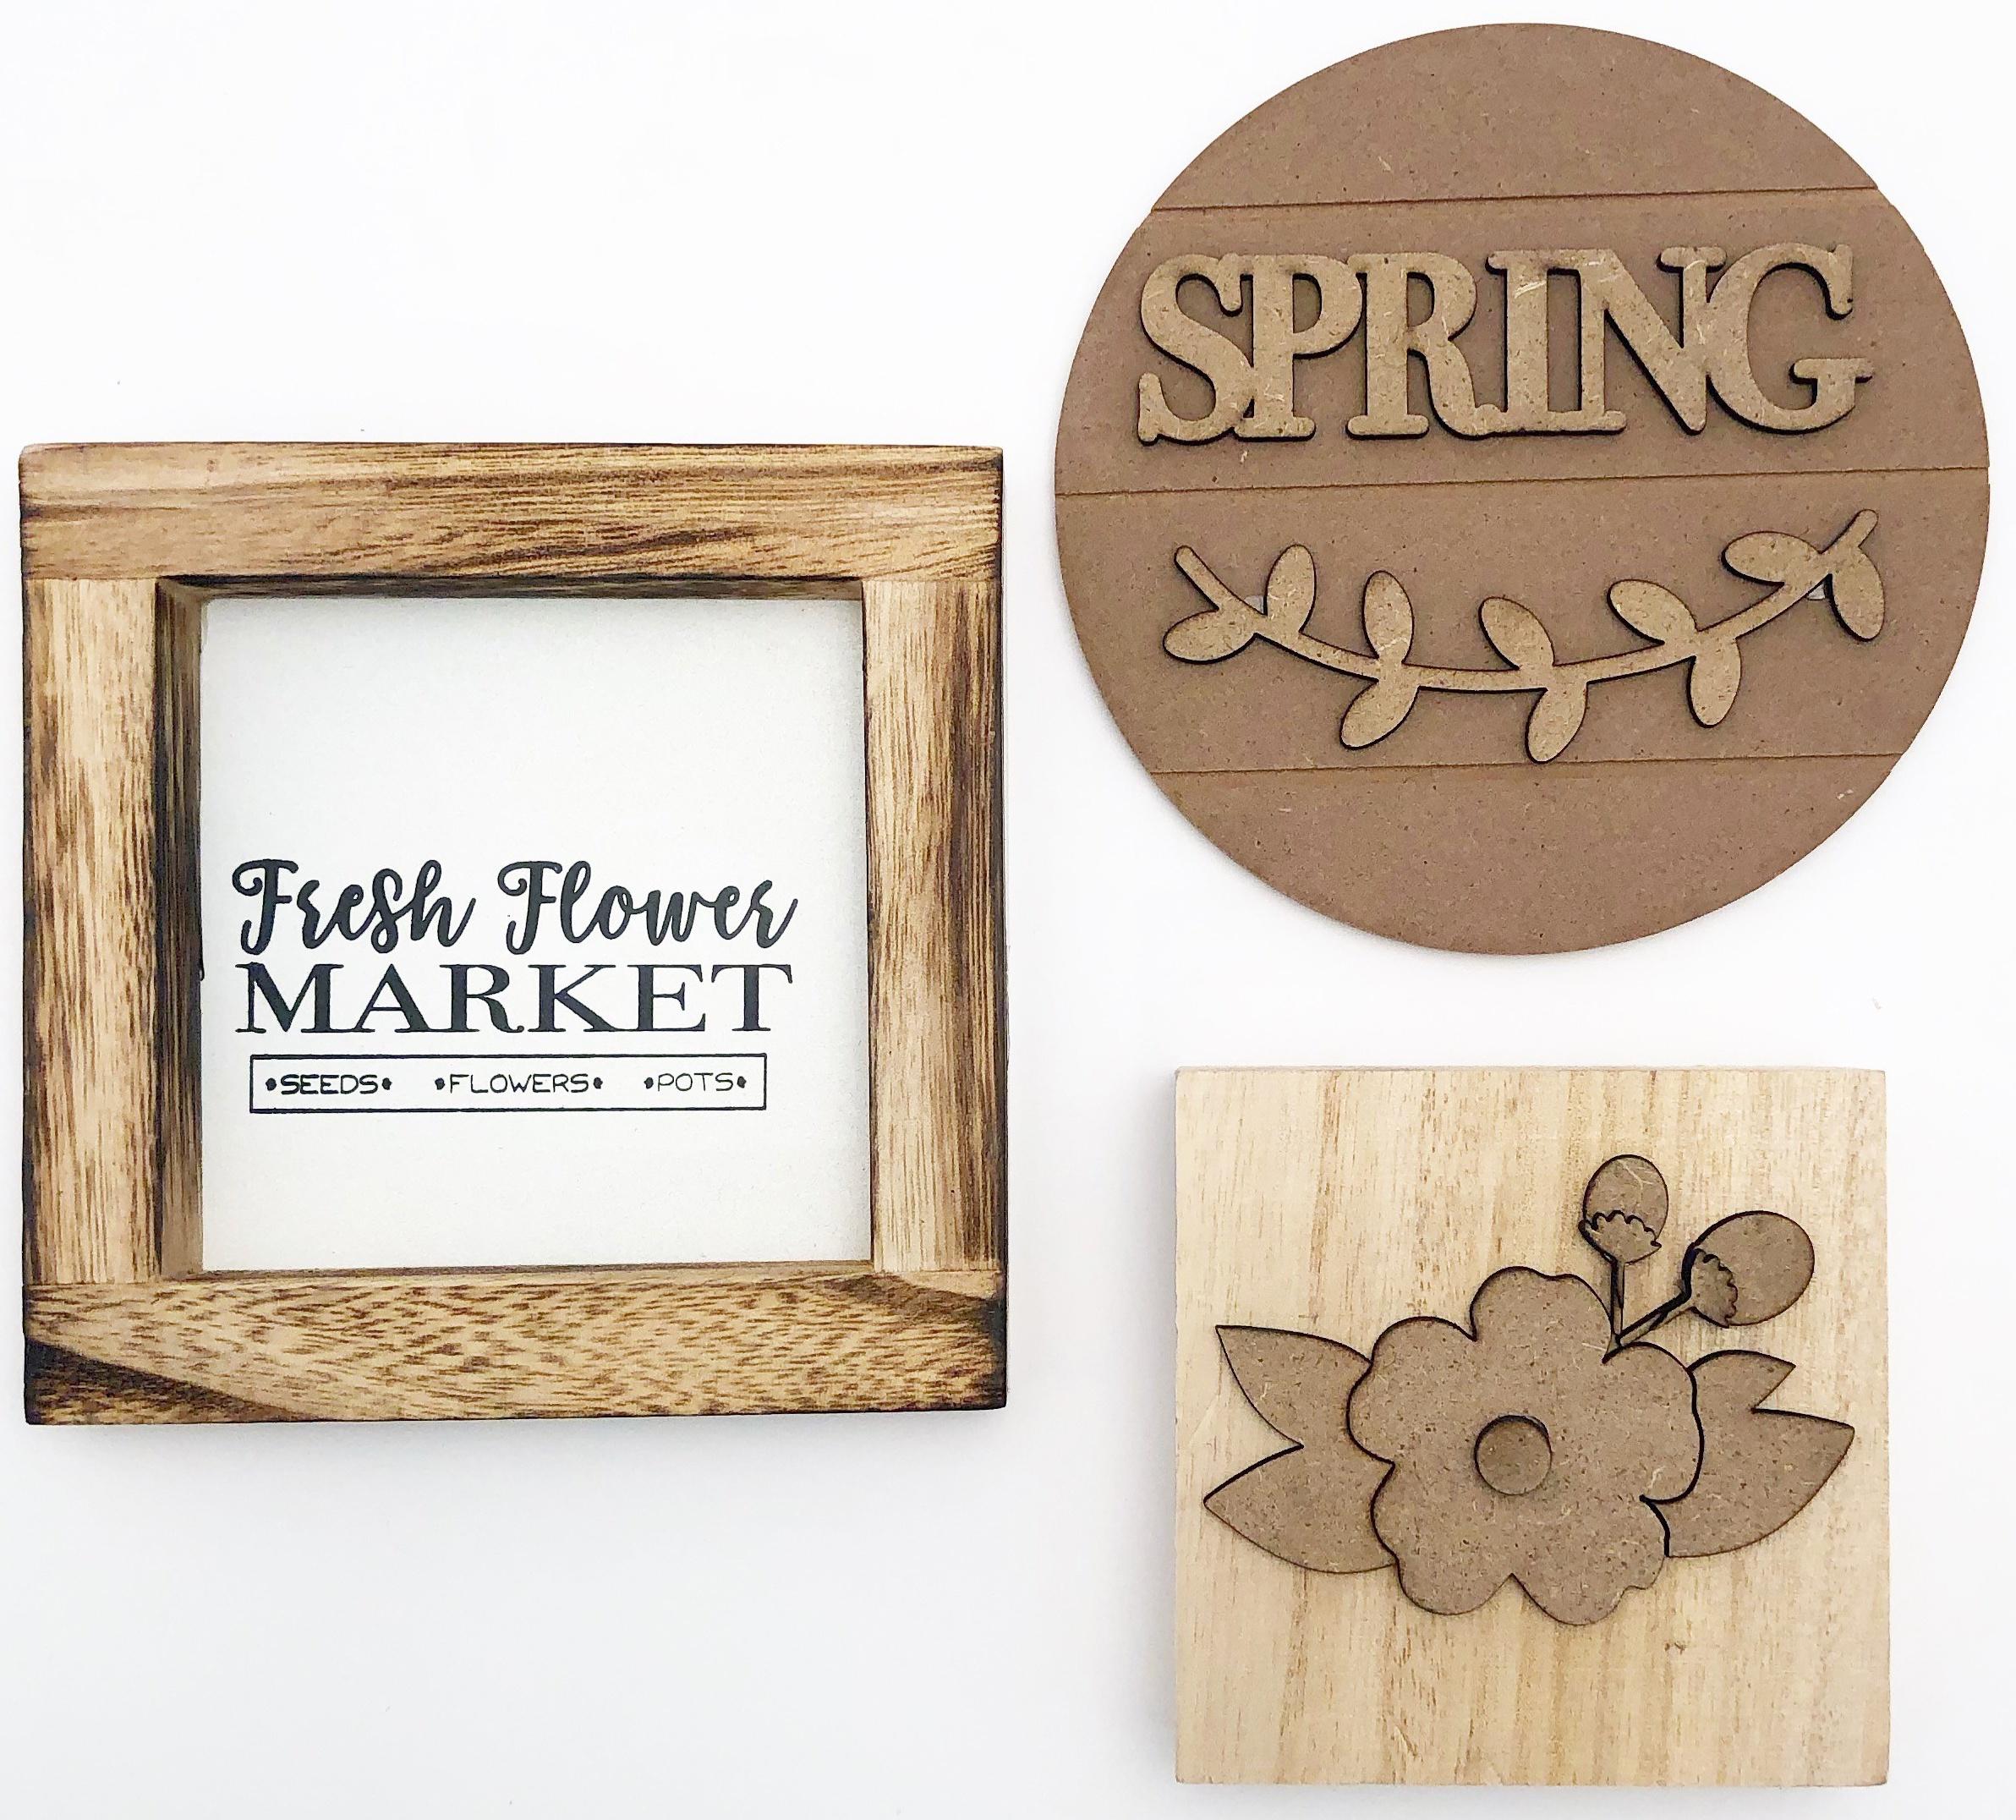 FD Tiered Tray Themed Kits-April